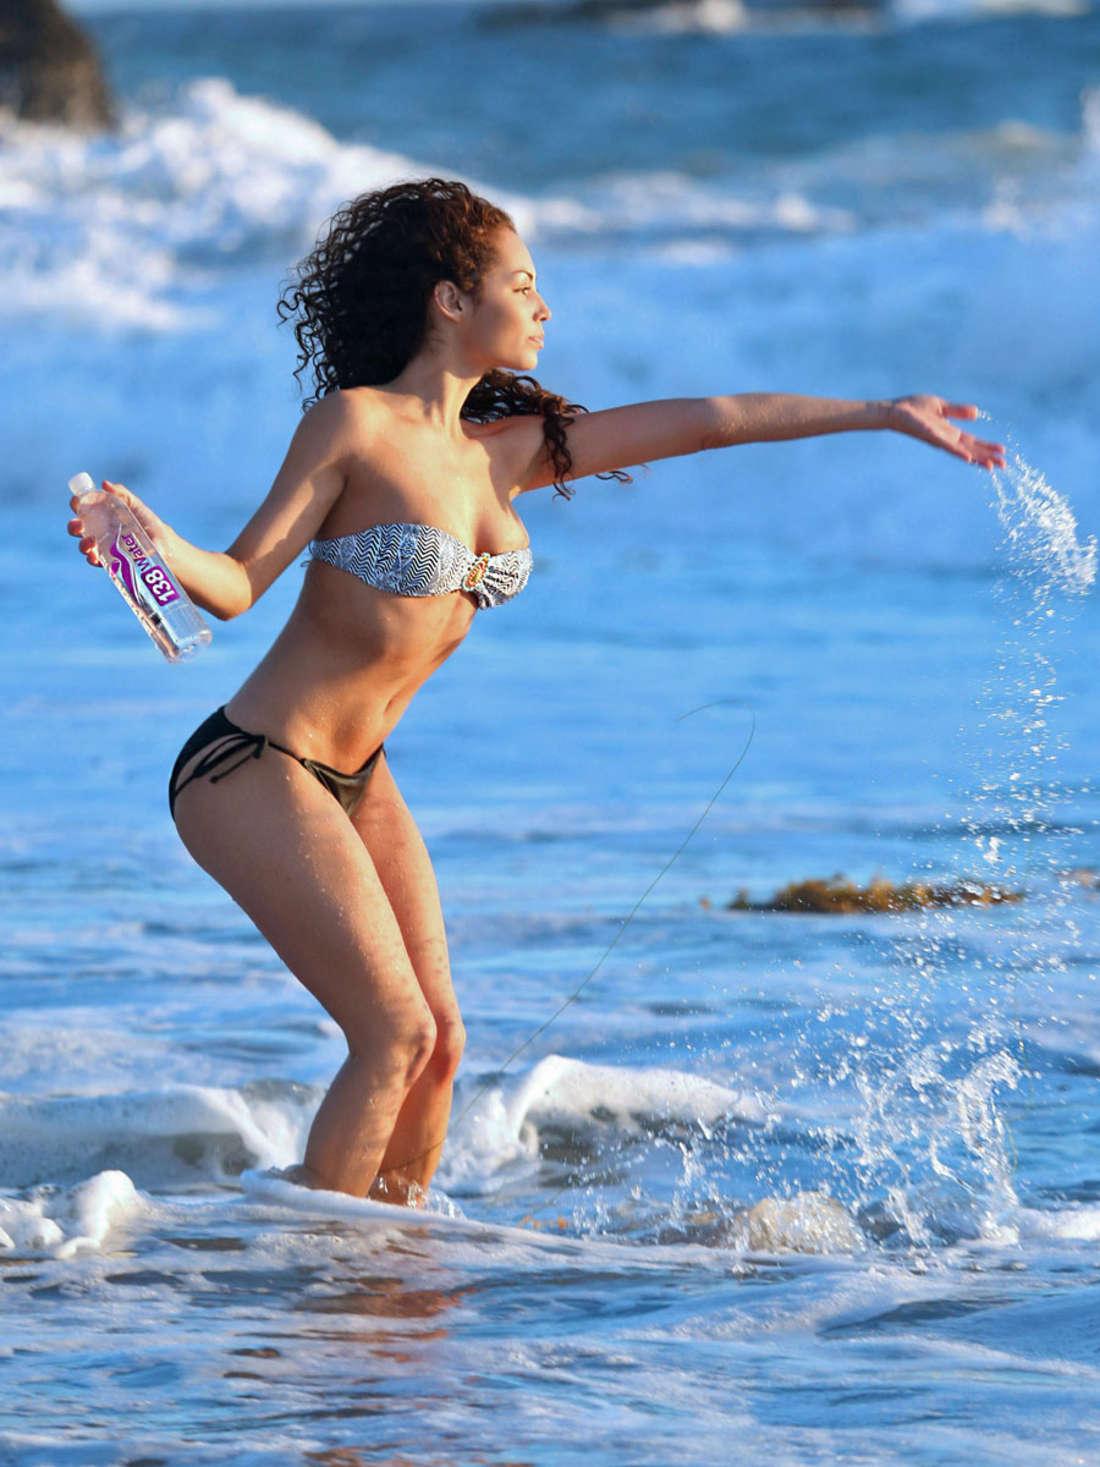 Jadeon Stage Water Bikini Photoshoot in Malibu